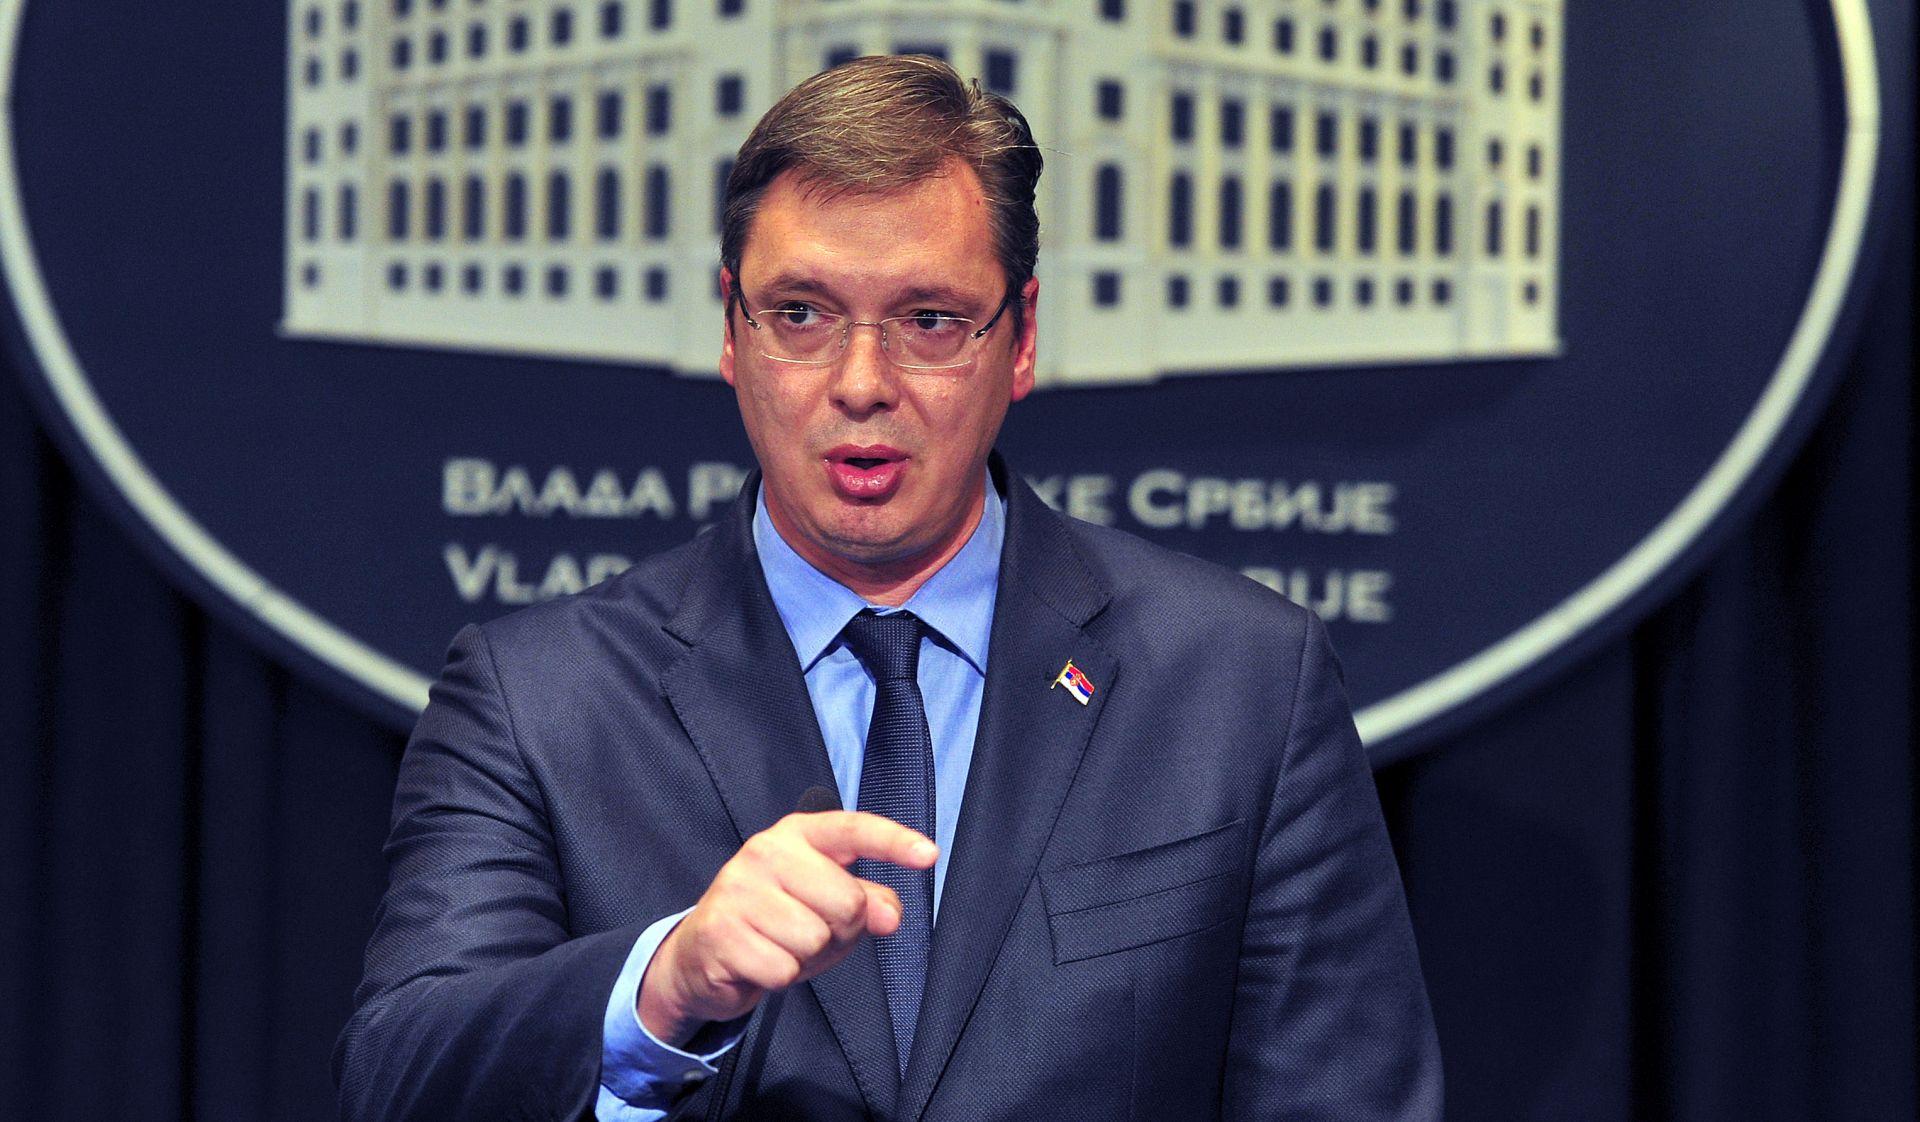 Srbija i Kosovo u Bruxellesu potpisali četiri sporazuma